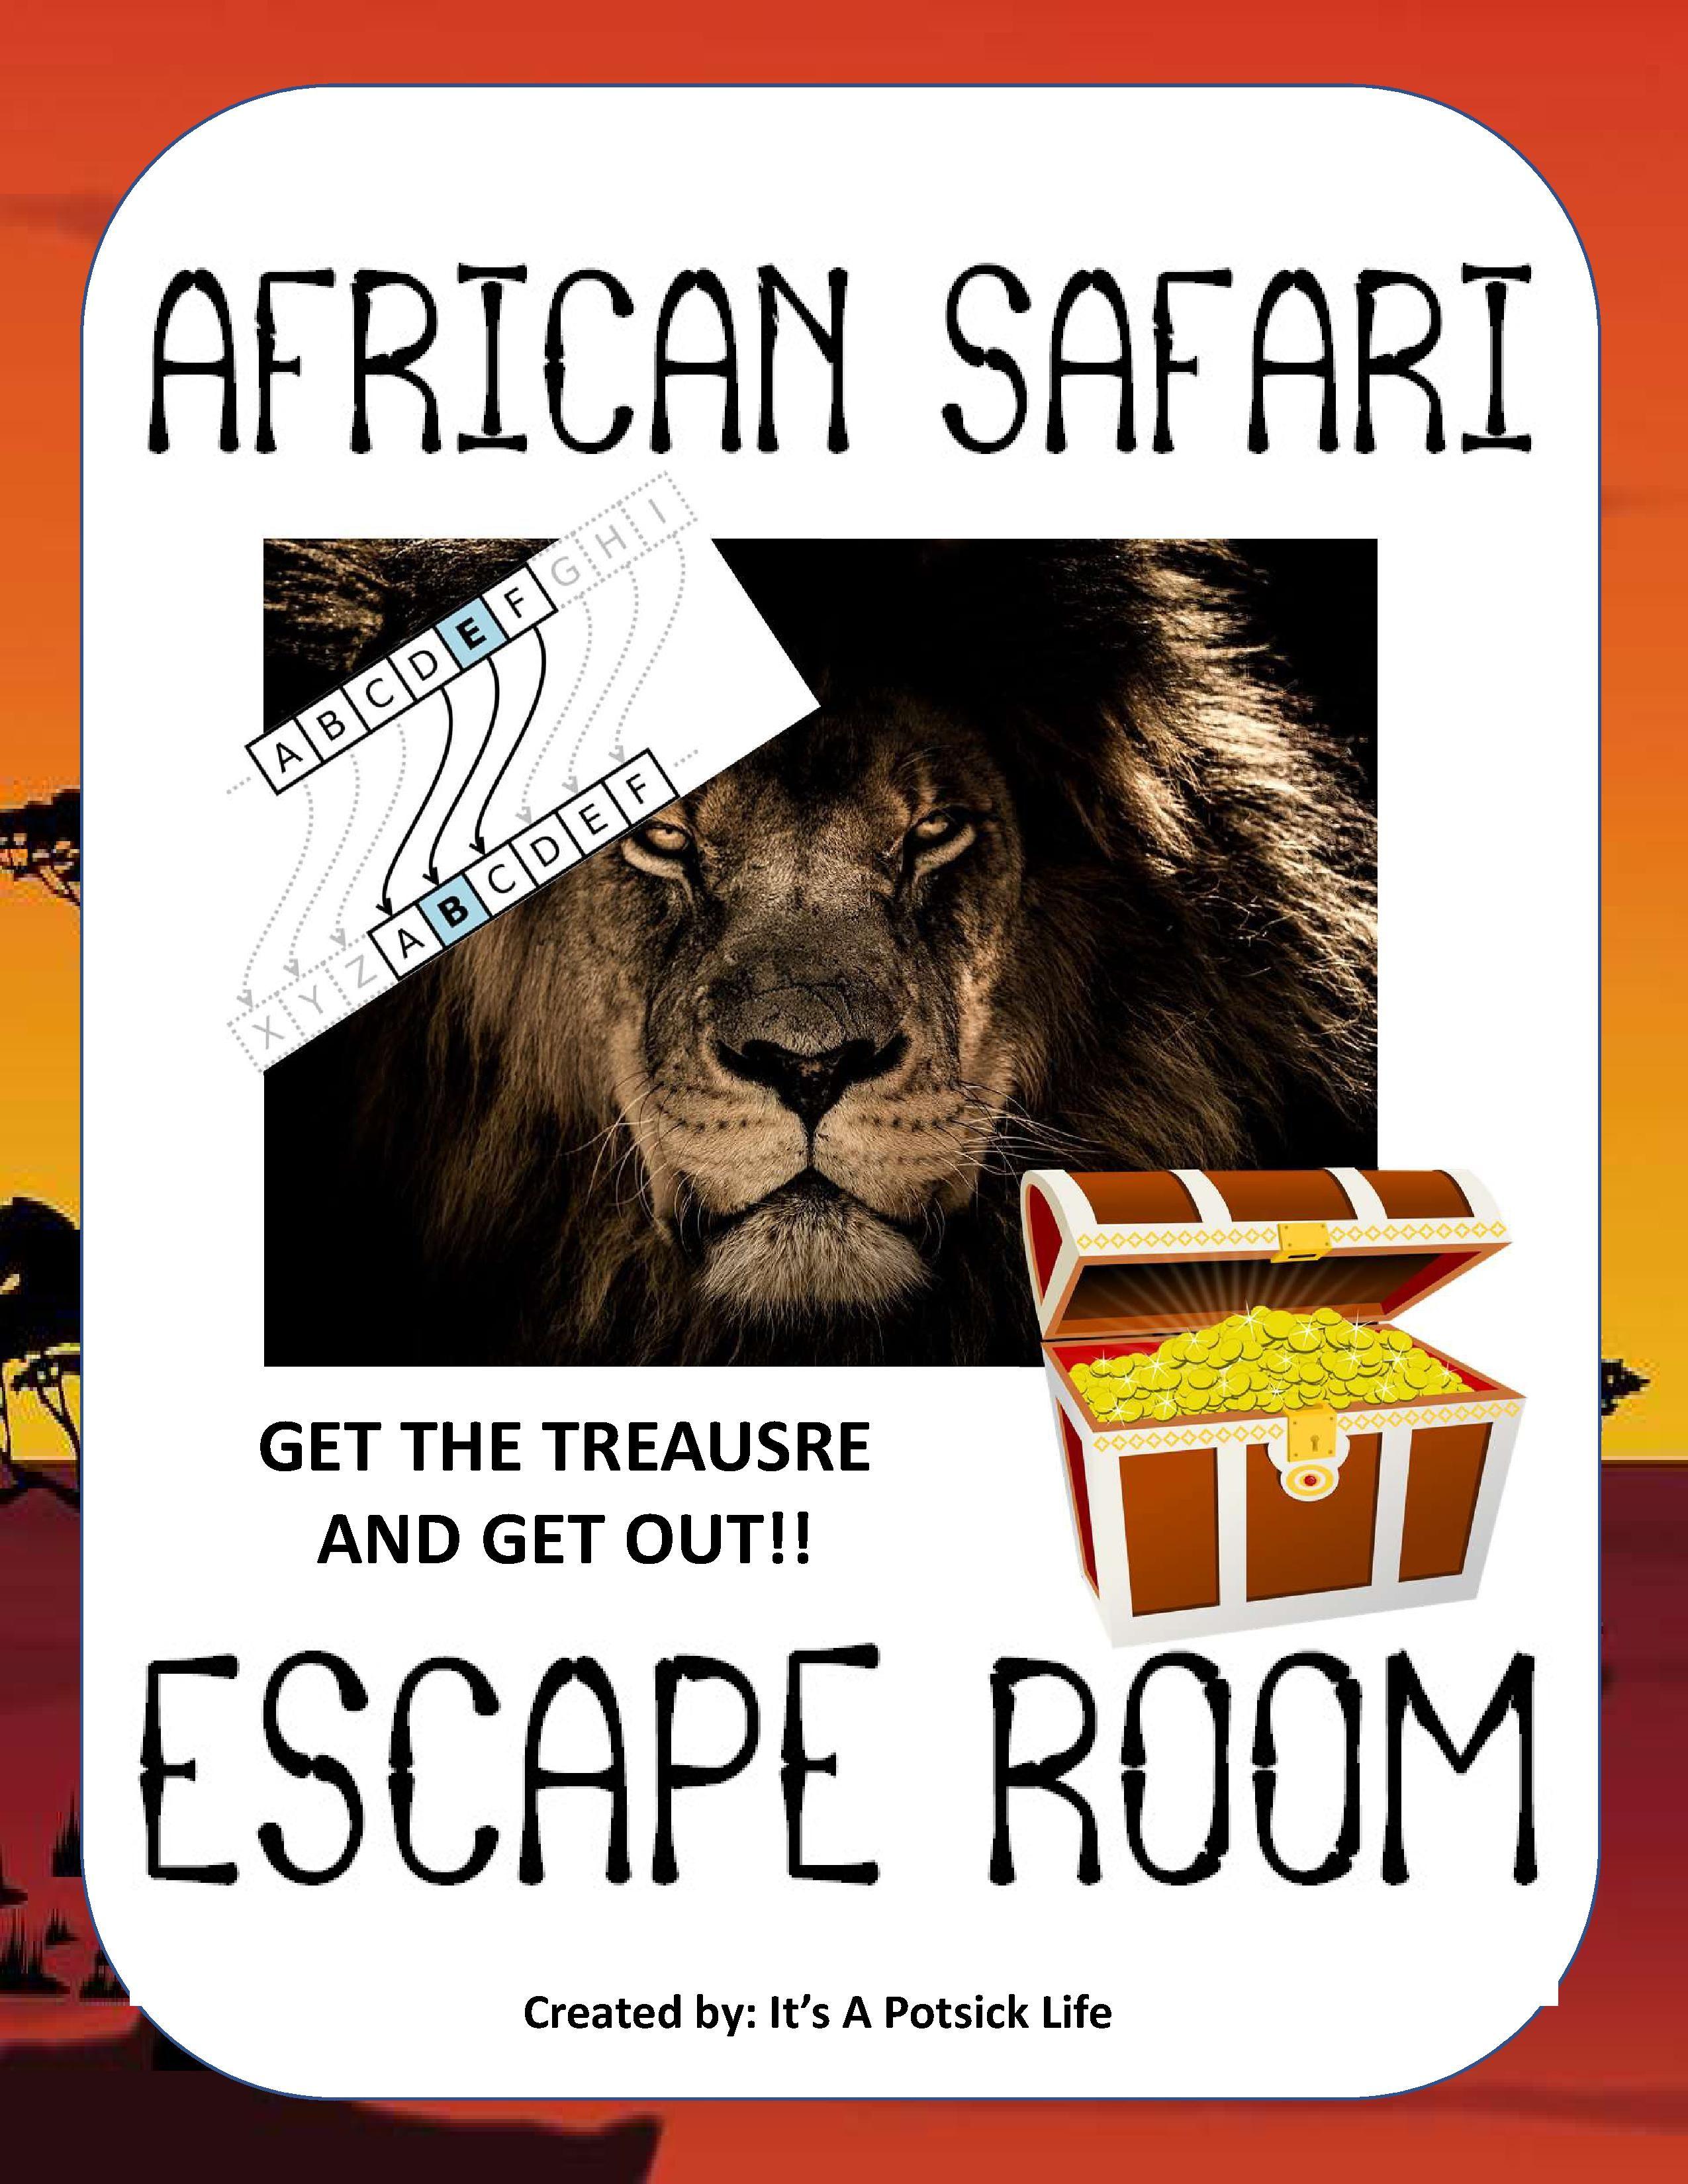 School Bag Lion Teal Lion School Bag Jungle Africa Safari